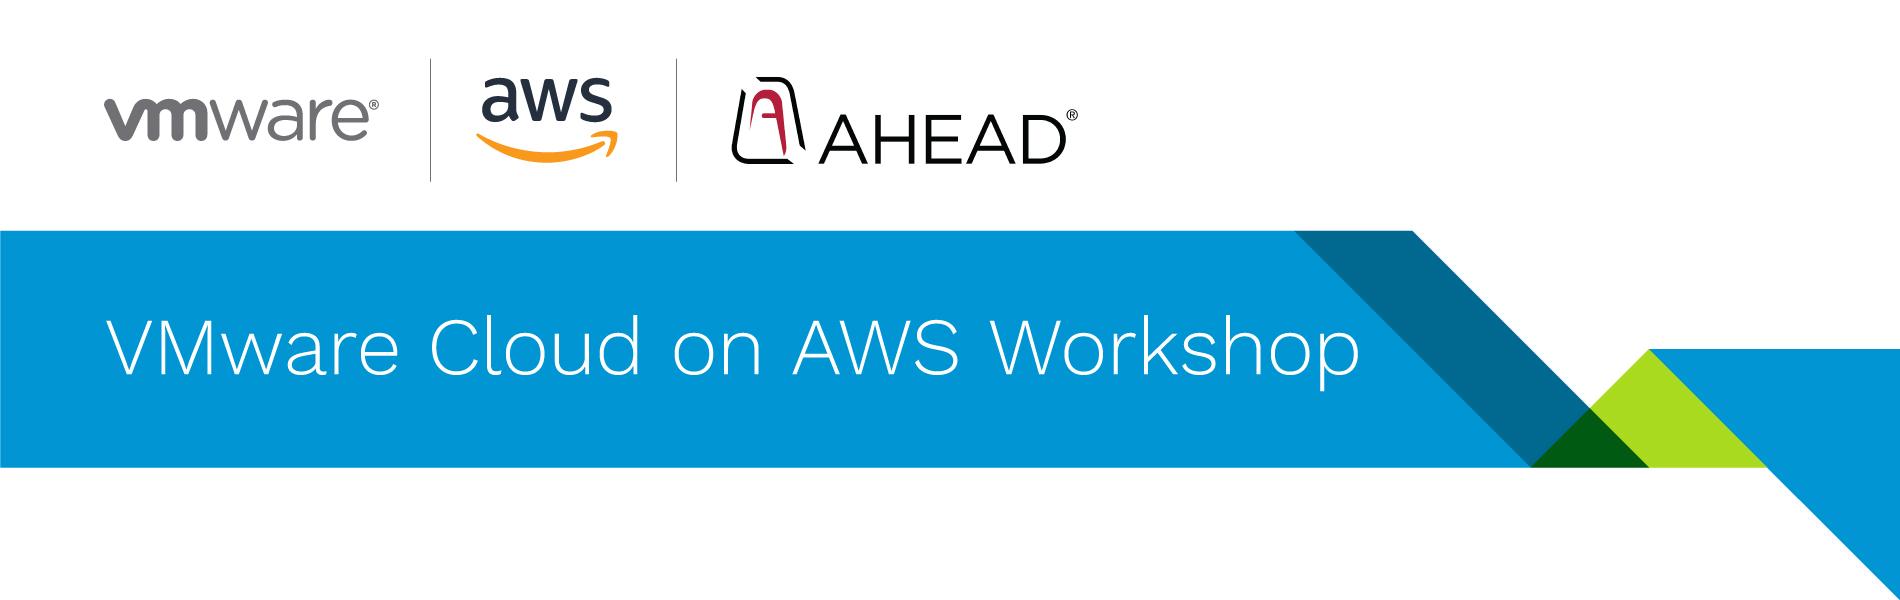 VMware Cloud on AWS - AHEAD